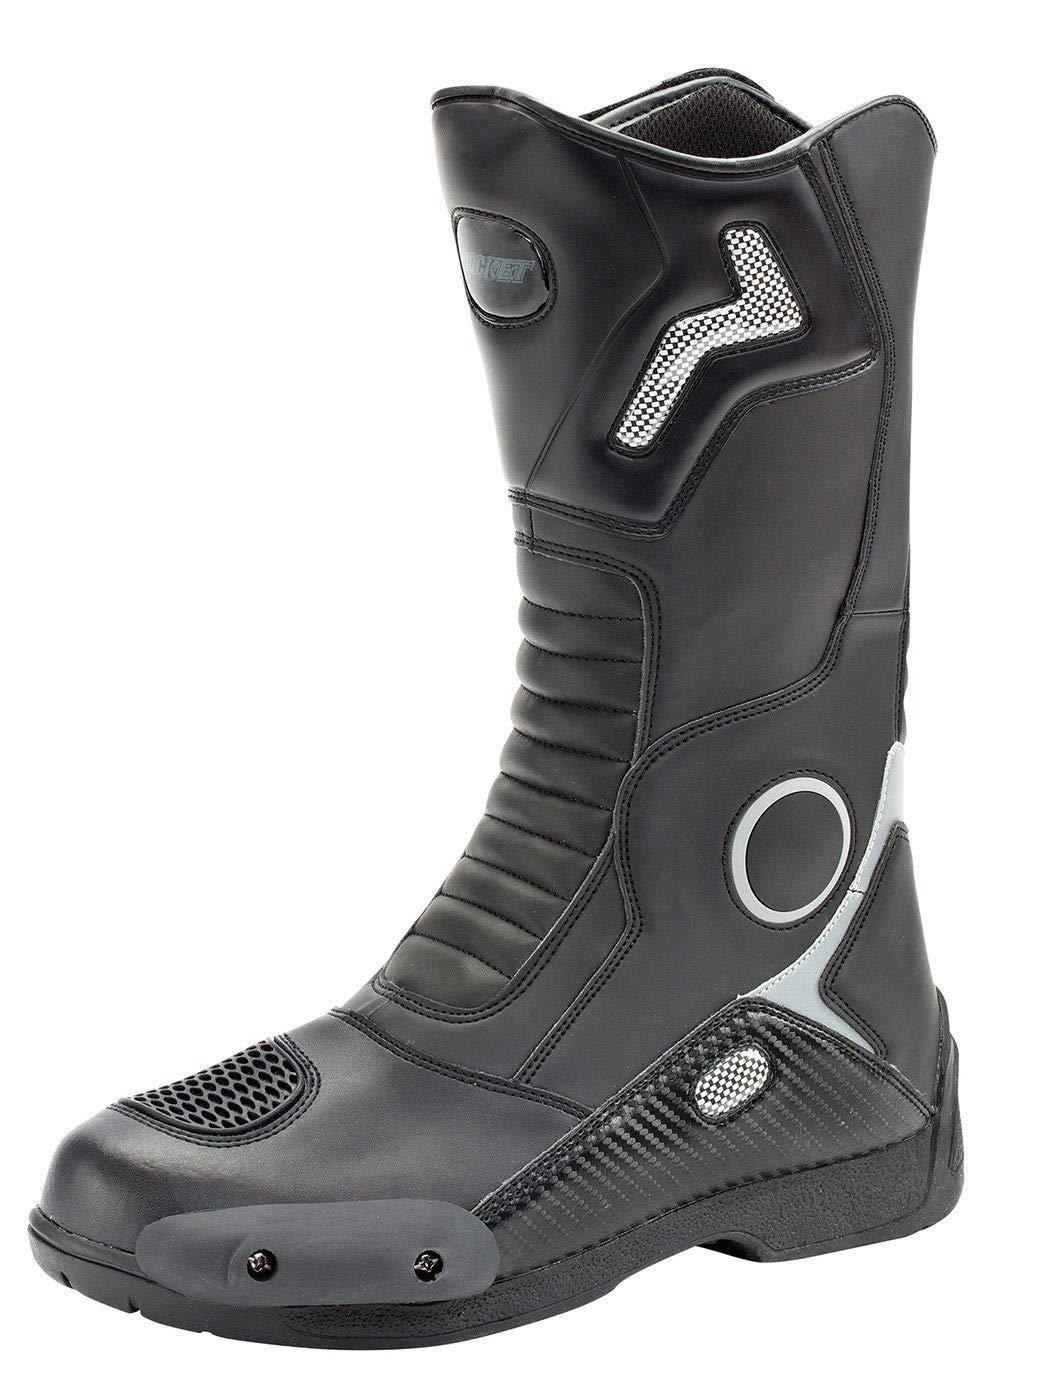 Joe Rocket 1377-0013 Ballistic Touring Men's Boots (Black, Size 13)